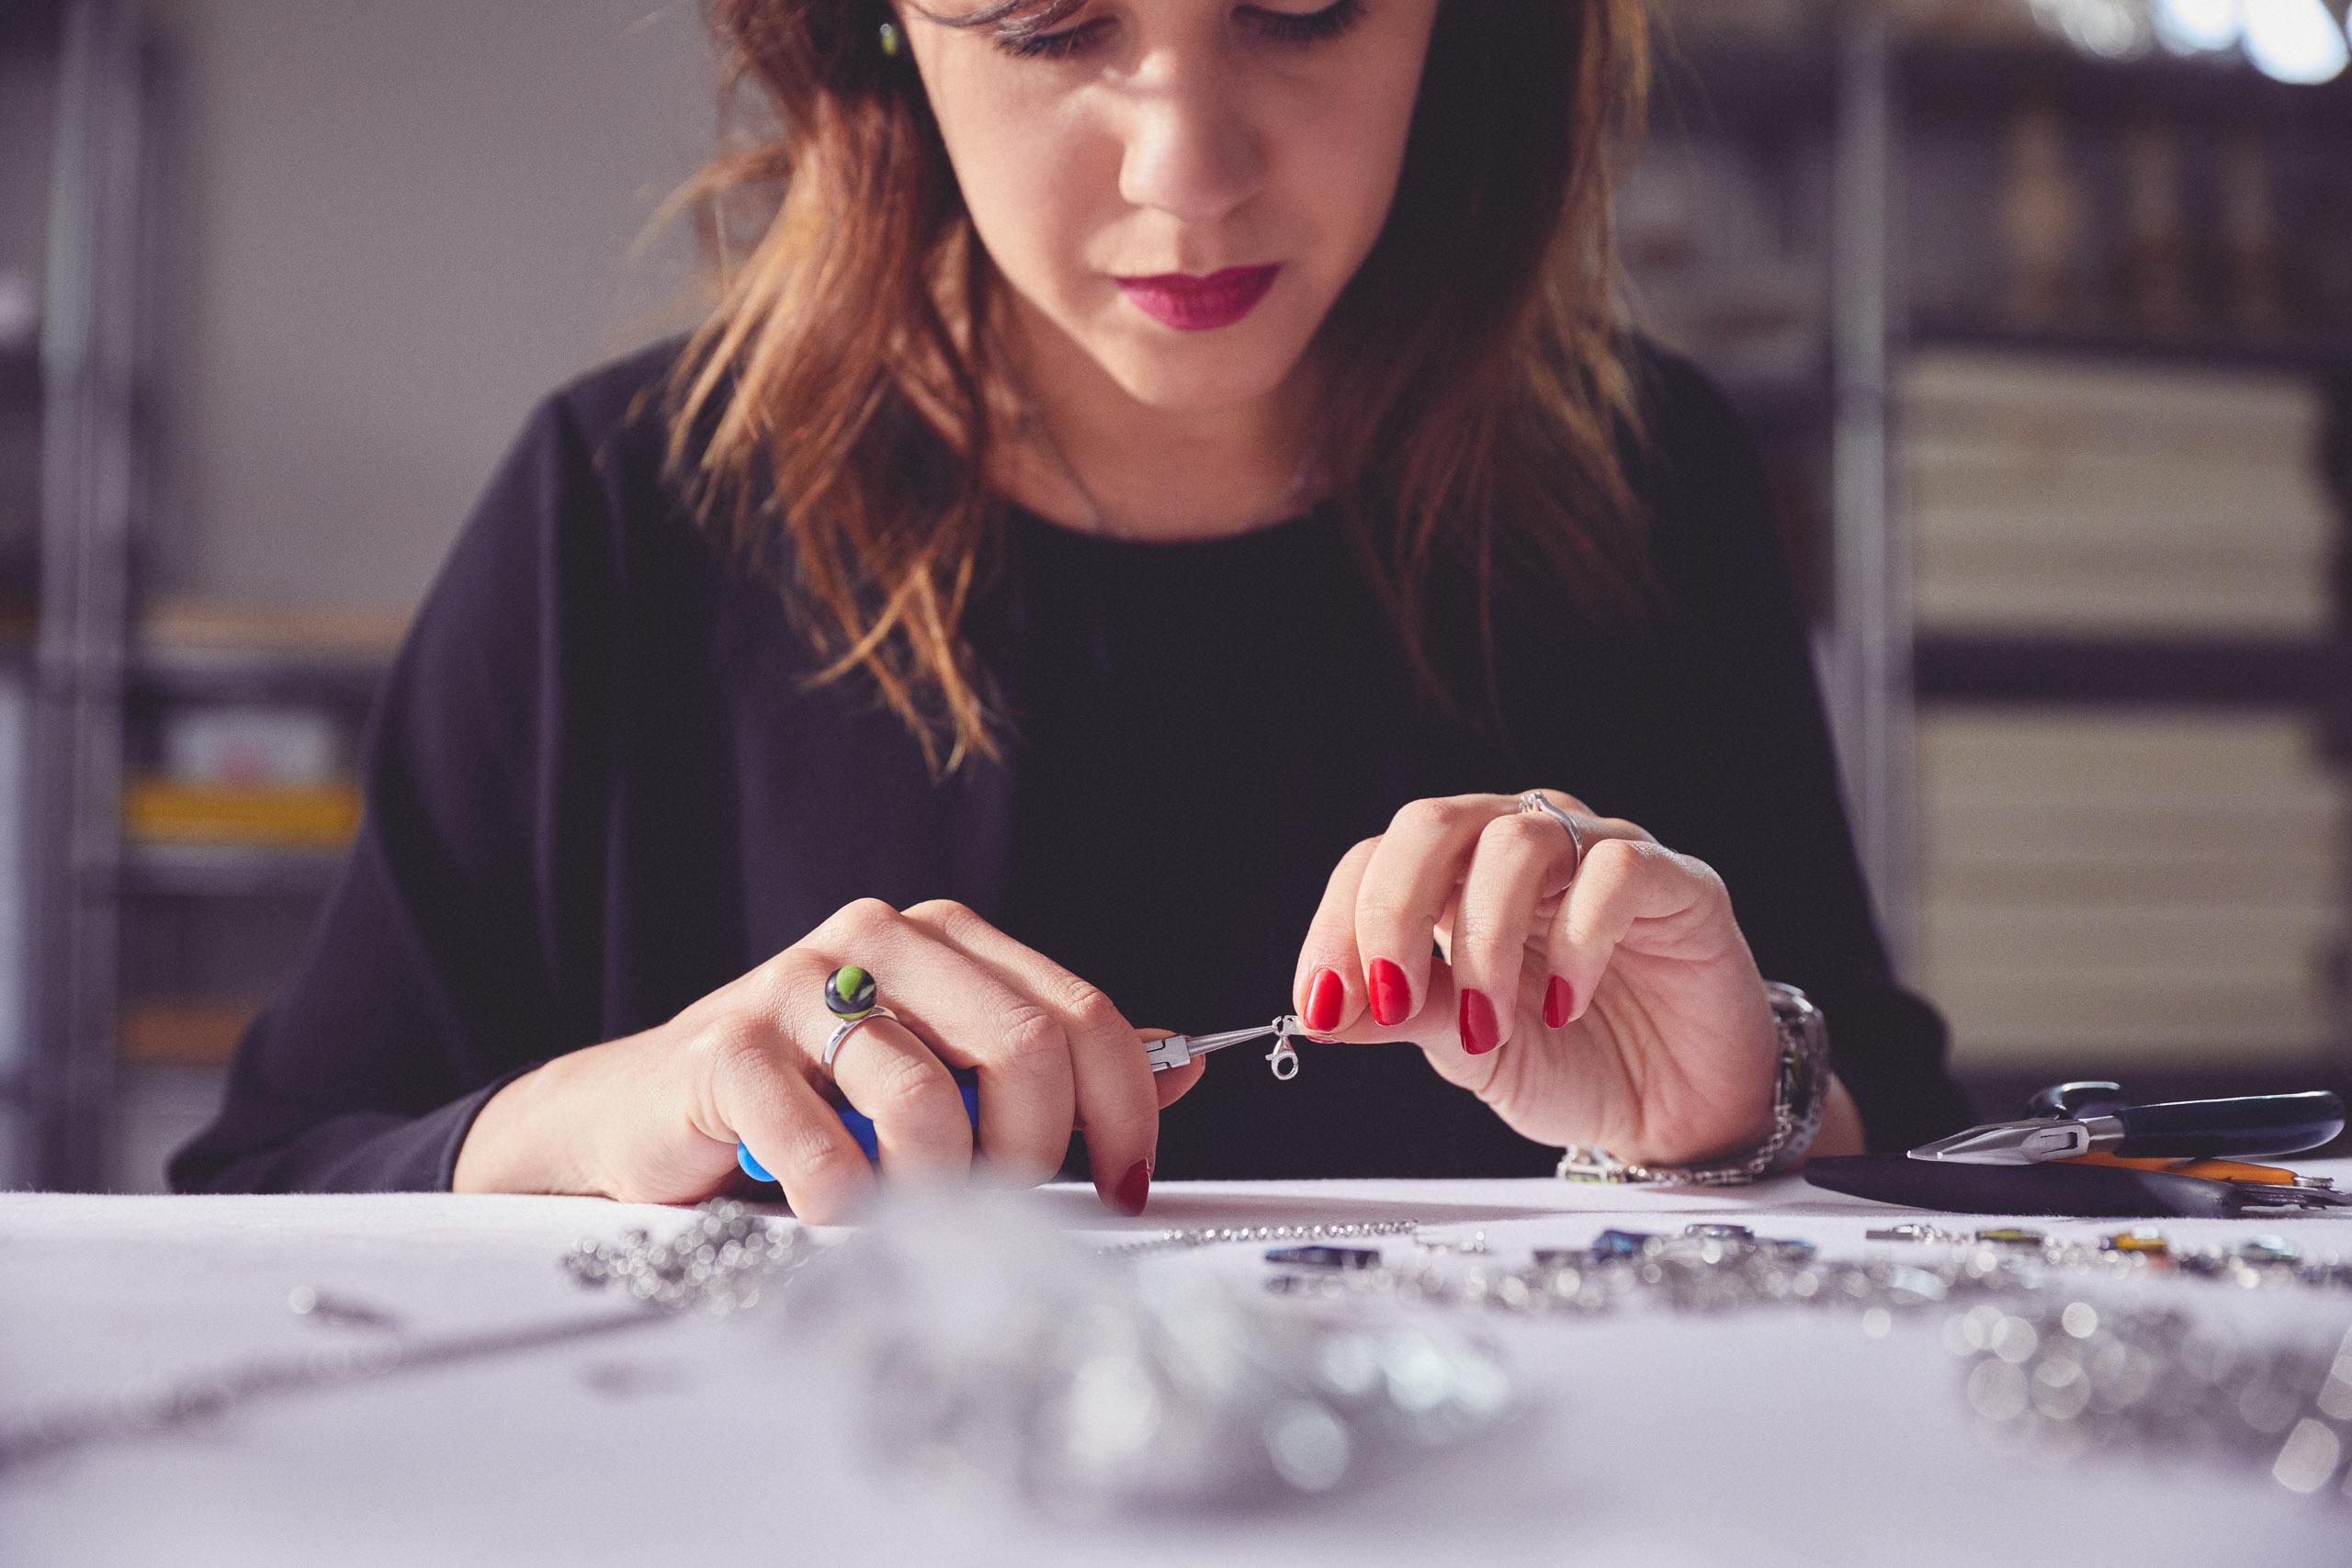 Anna Barola Italian Jewels - Articity - Perugia, Umbria